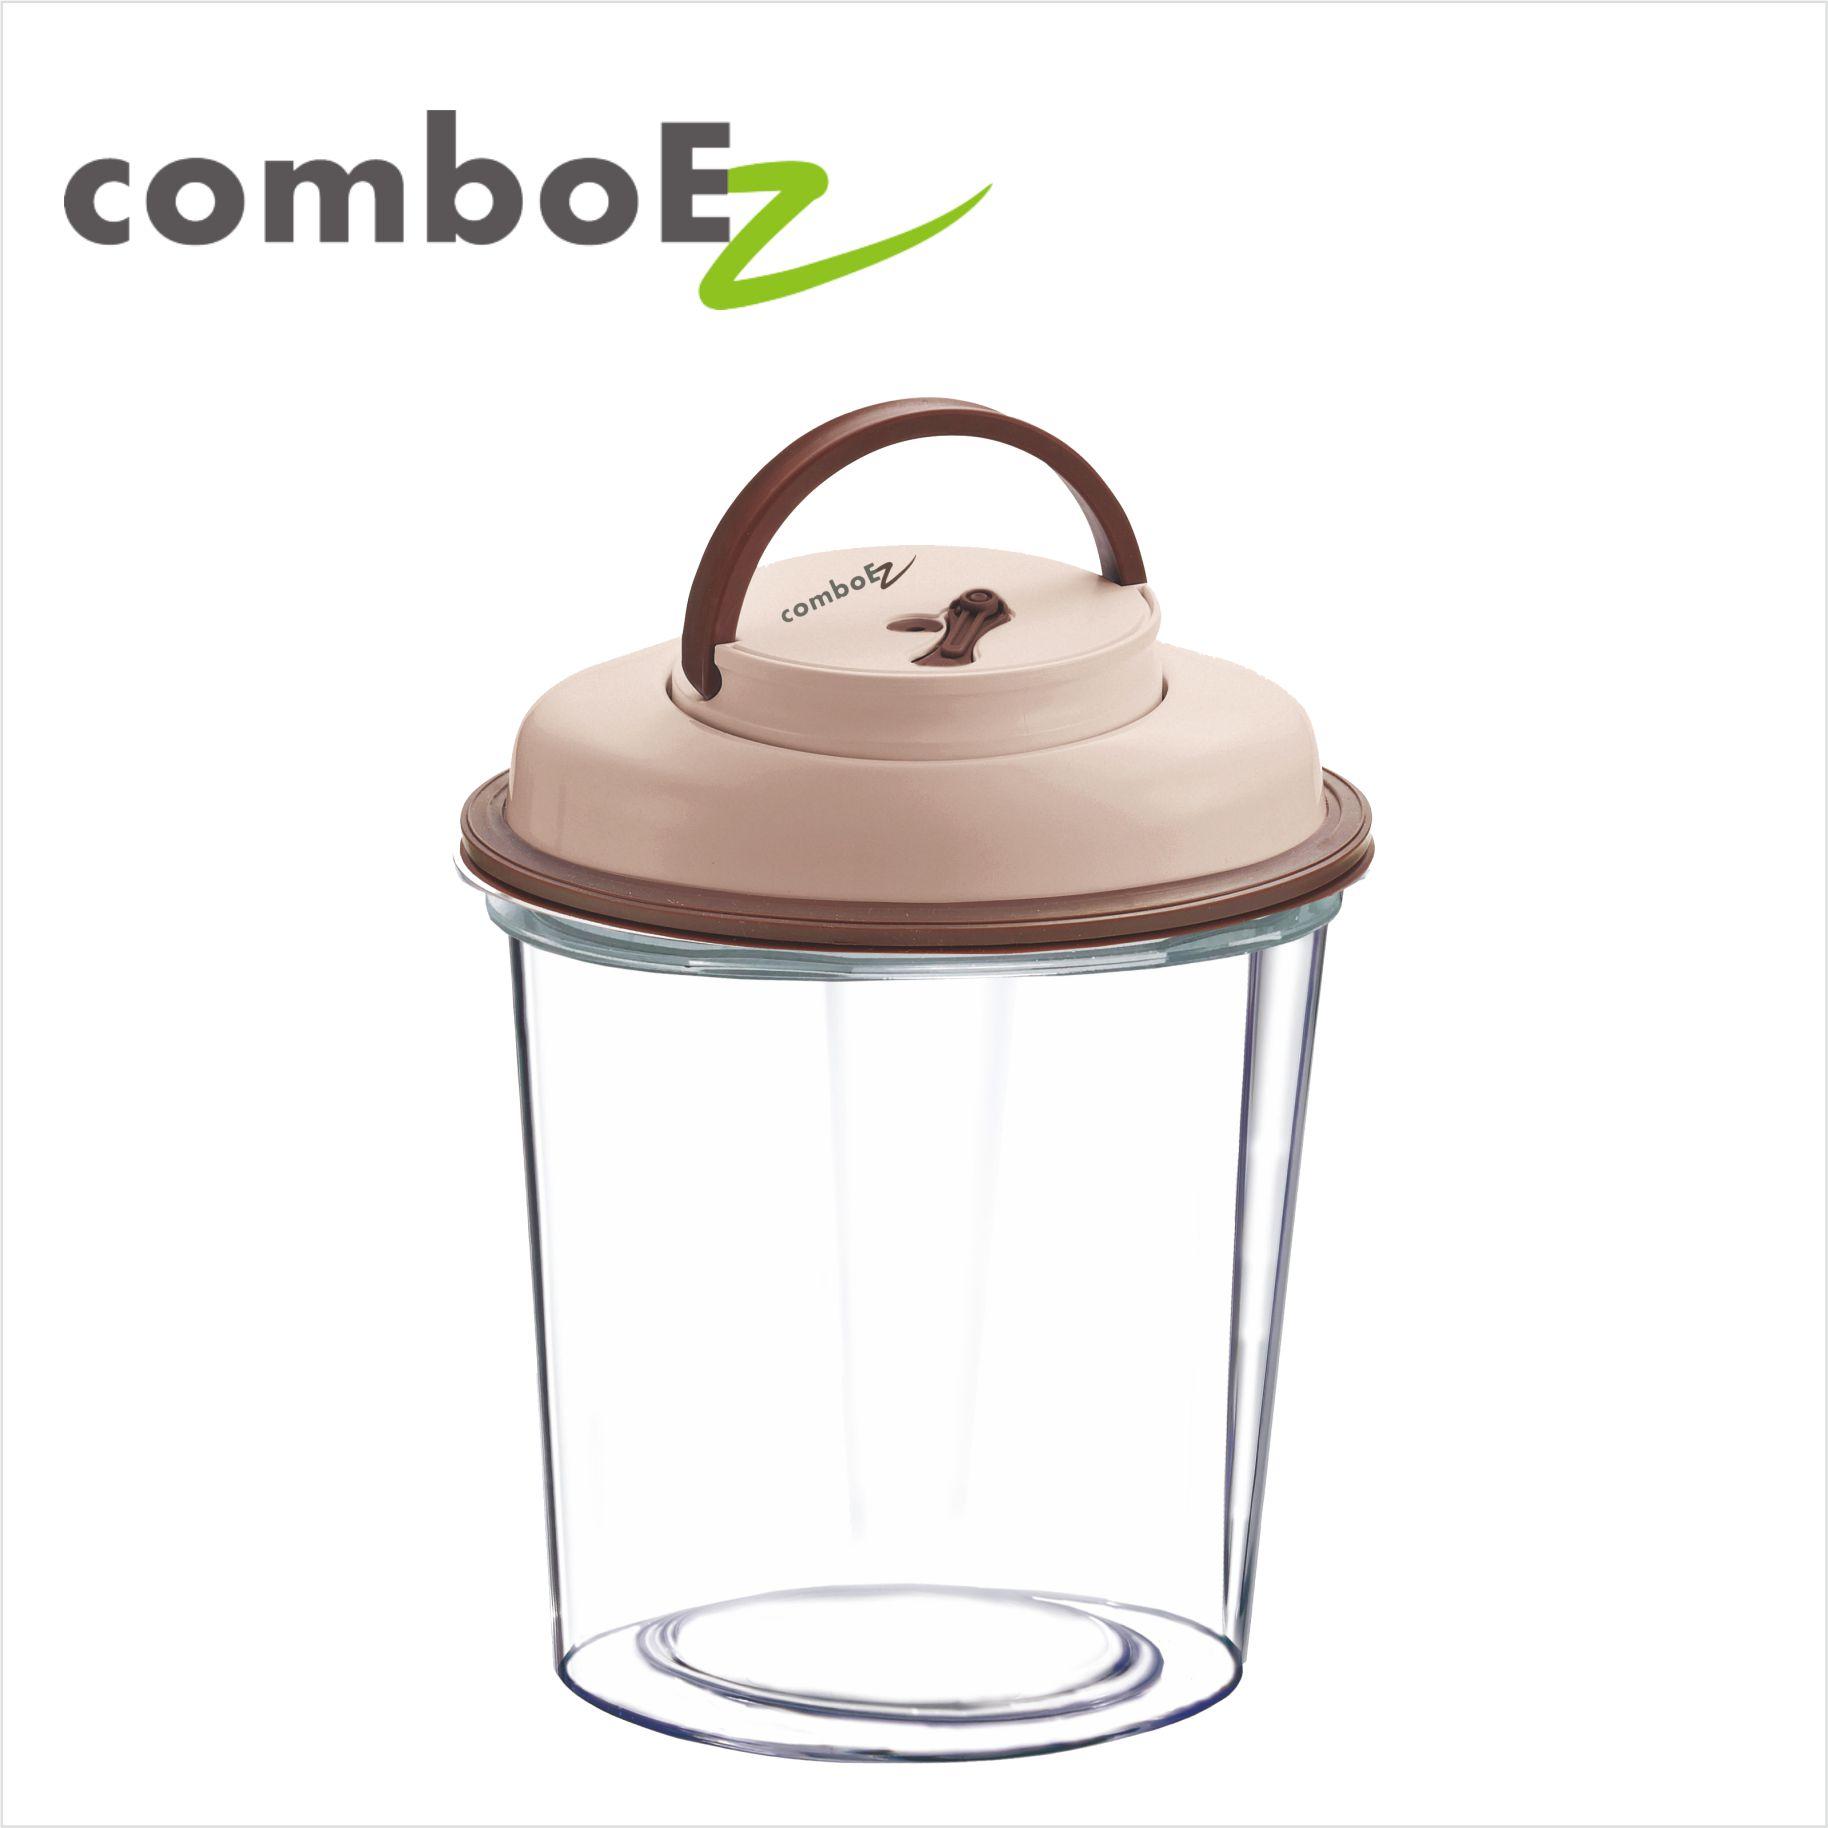 COMBOEZ保鲜盒5L手柄款